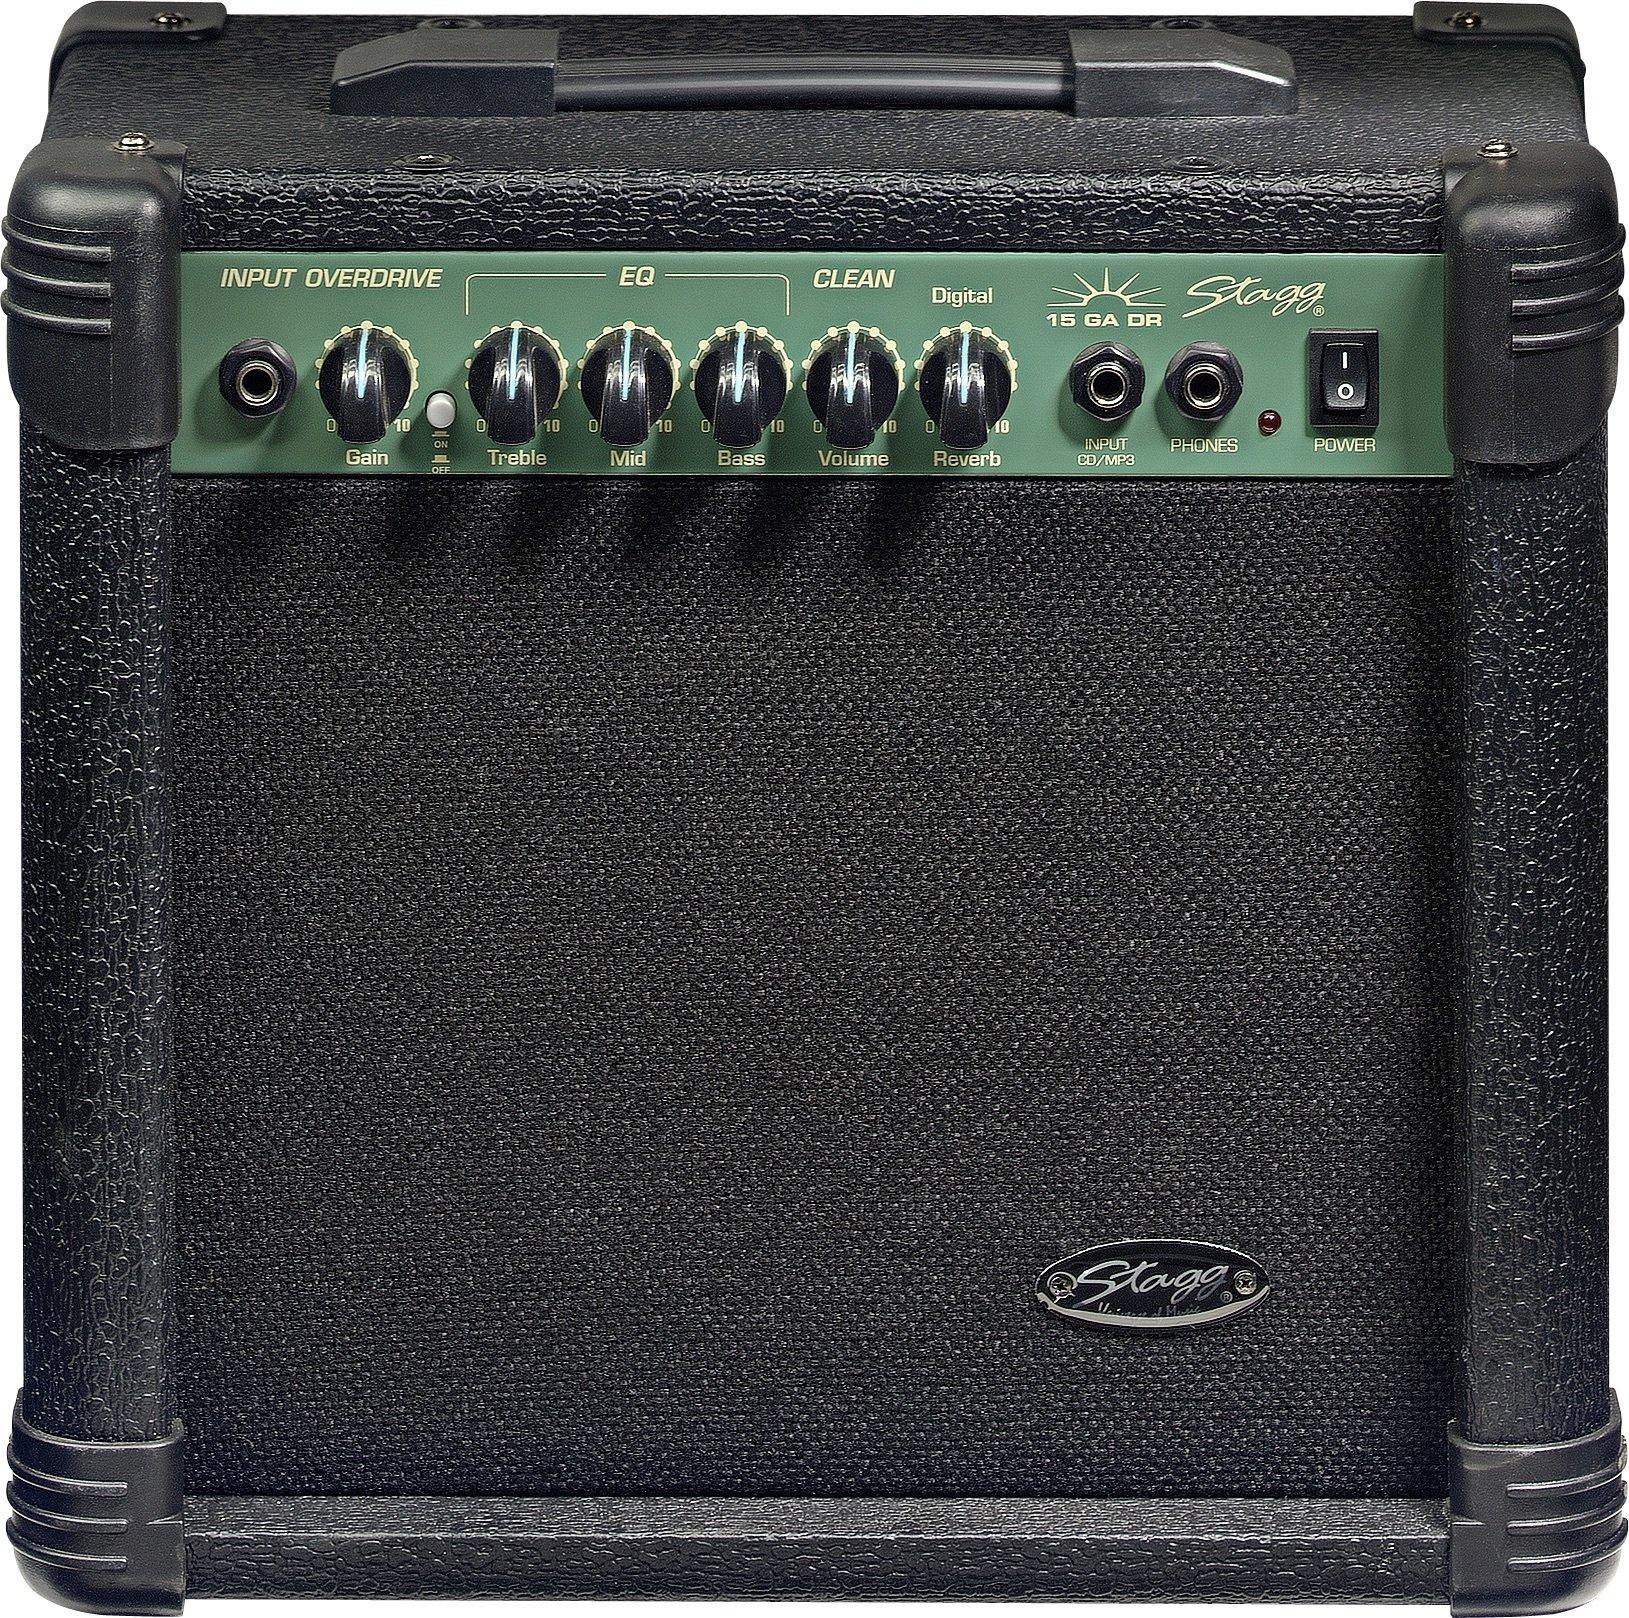 Stagg 15 GA DR - Digital Reverb Electric Guitar Amplifier 00144